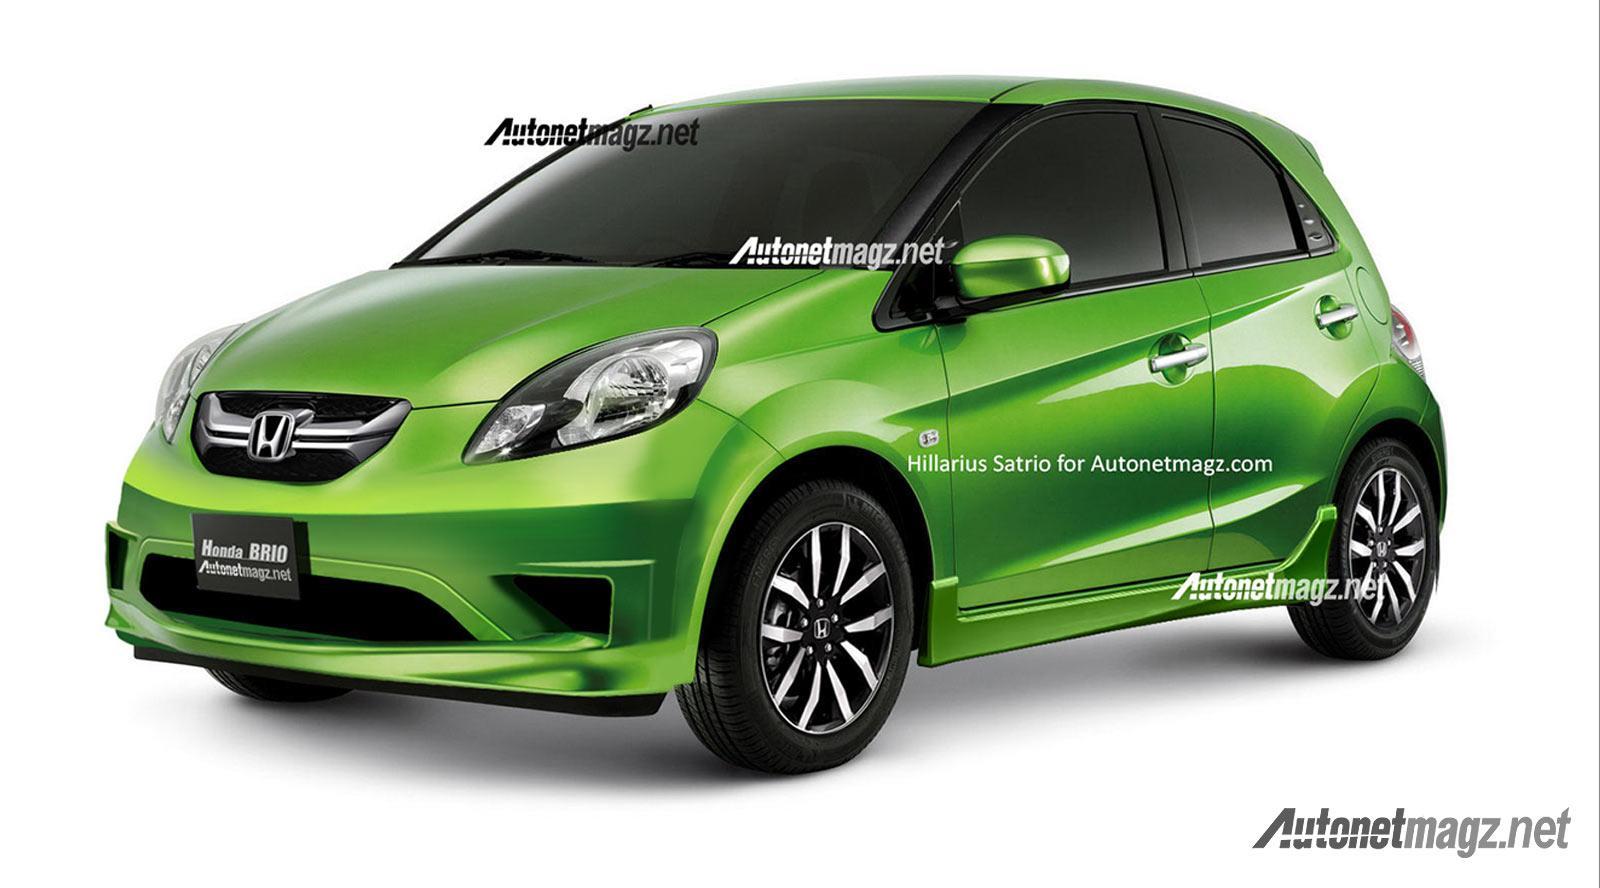 Rendering: Honda Brio Facelift